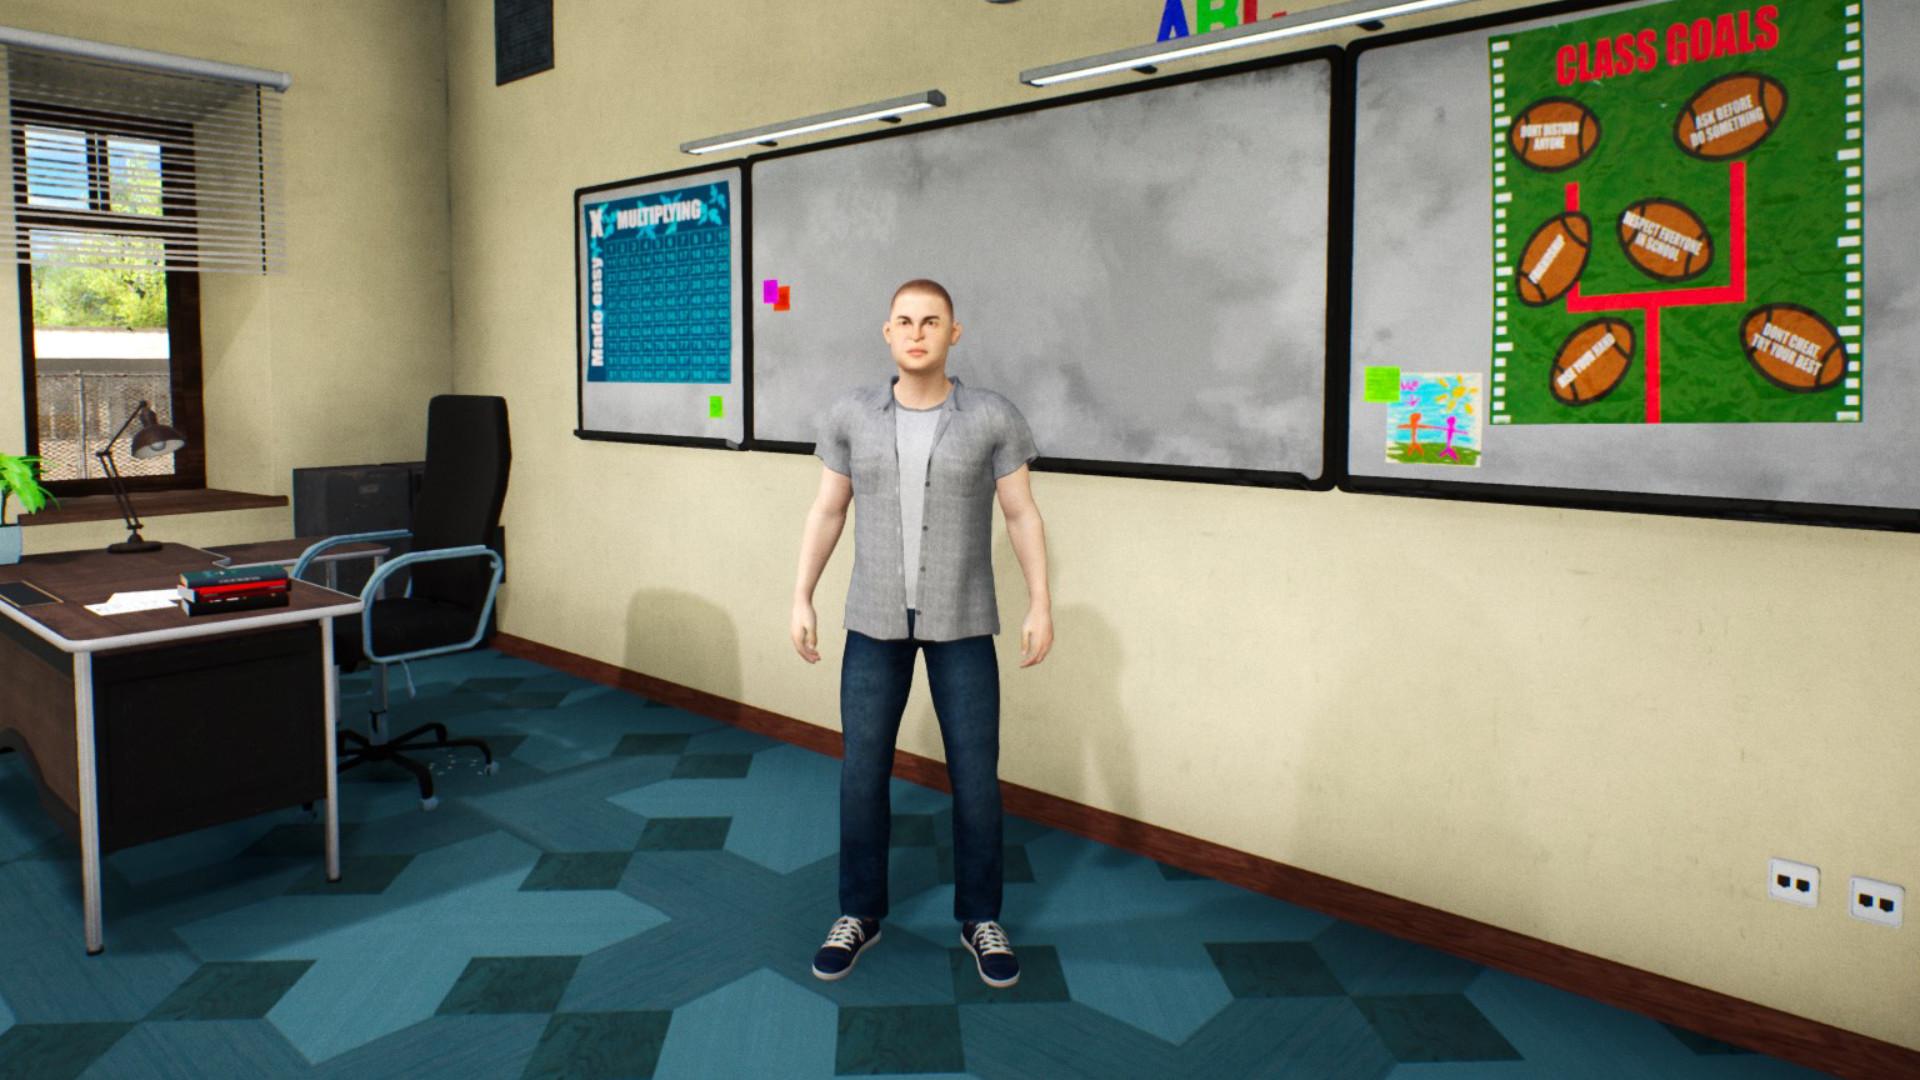 Bad Guys at School screenshot